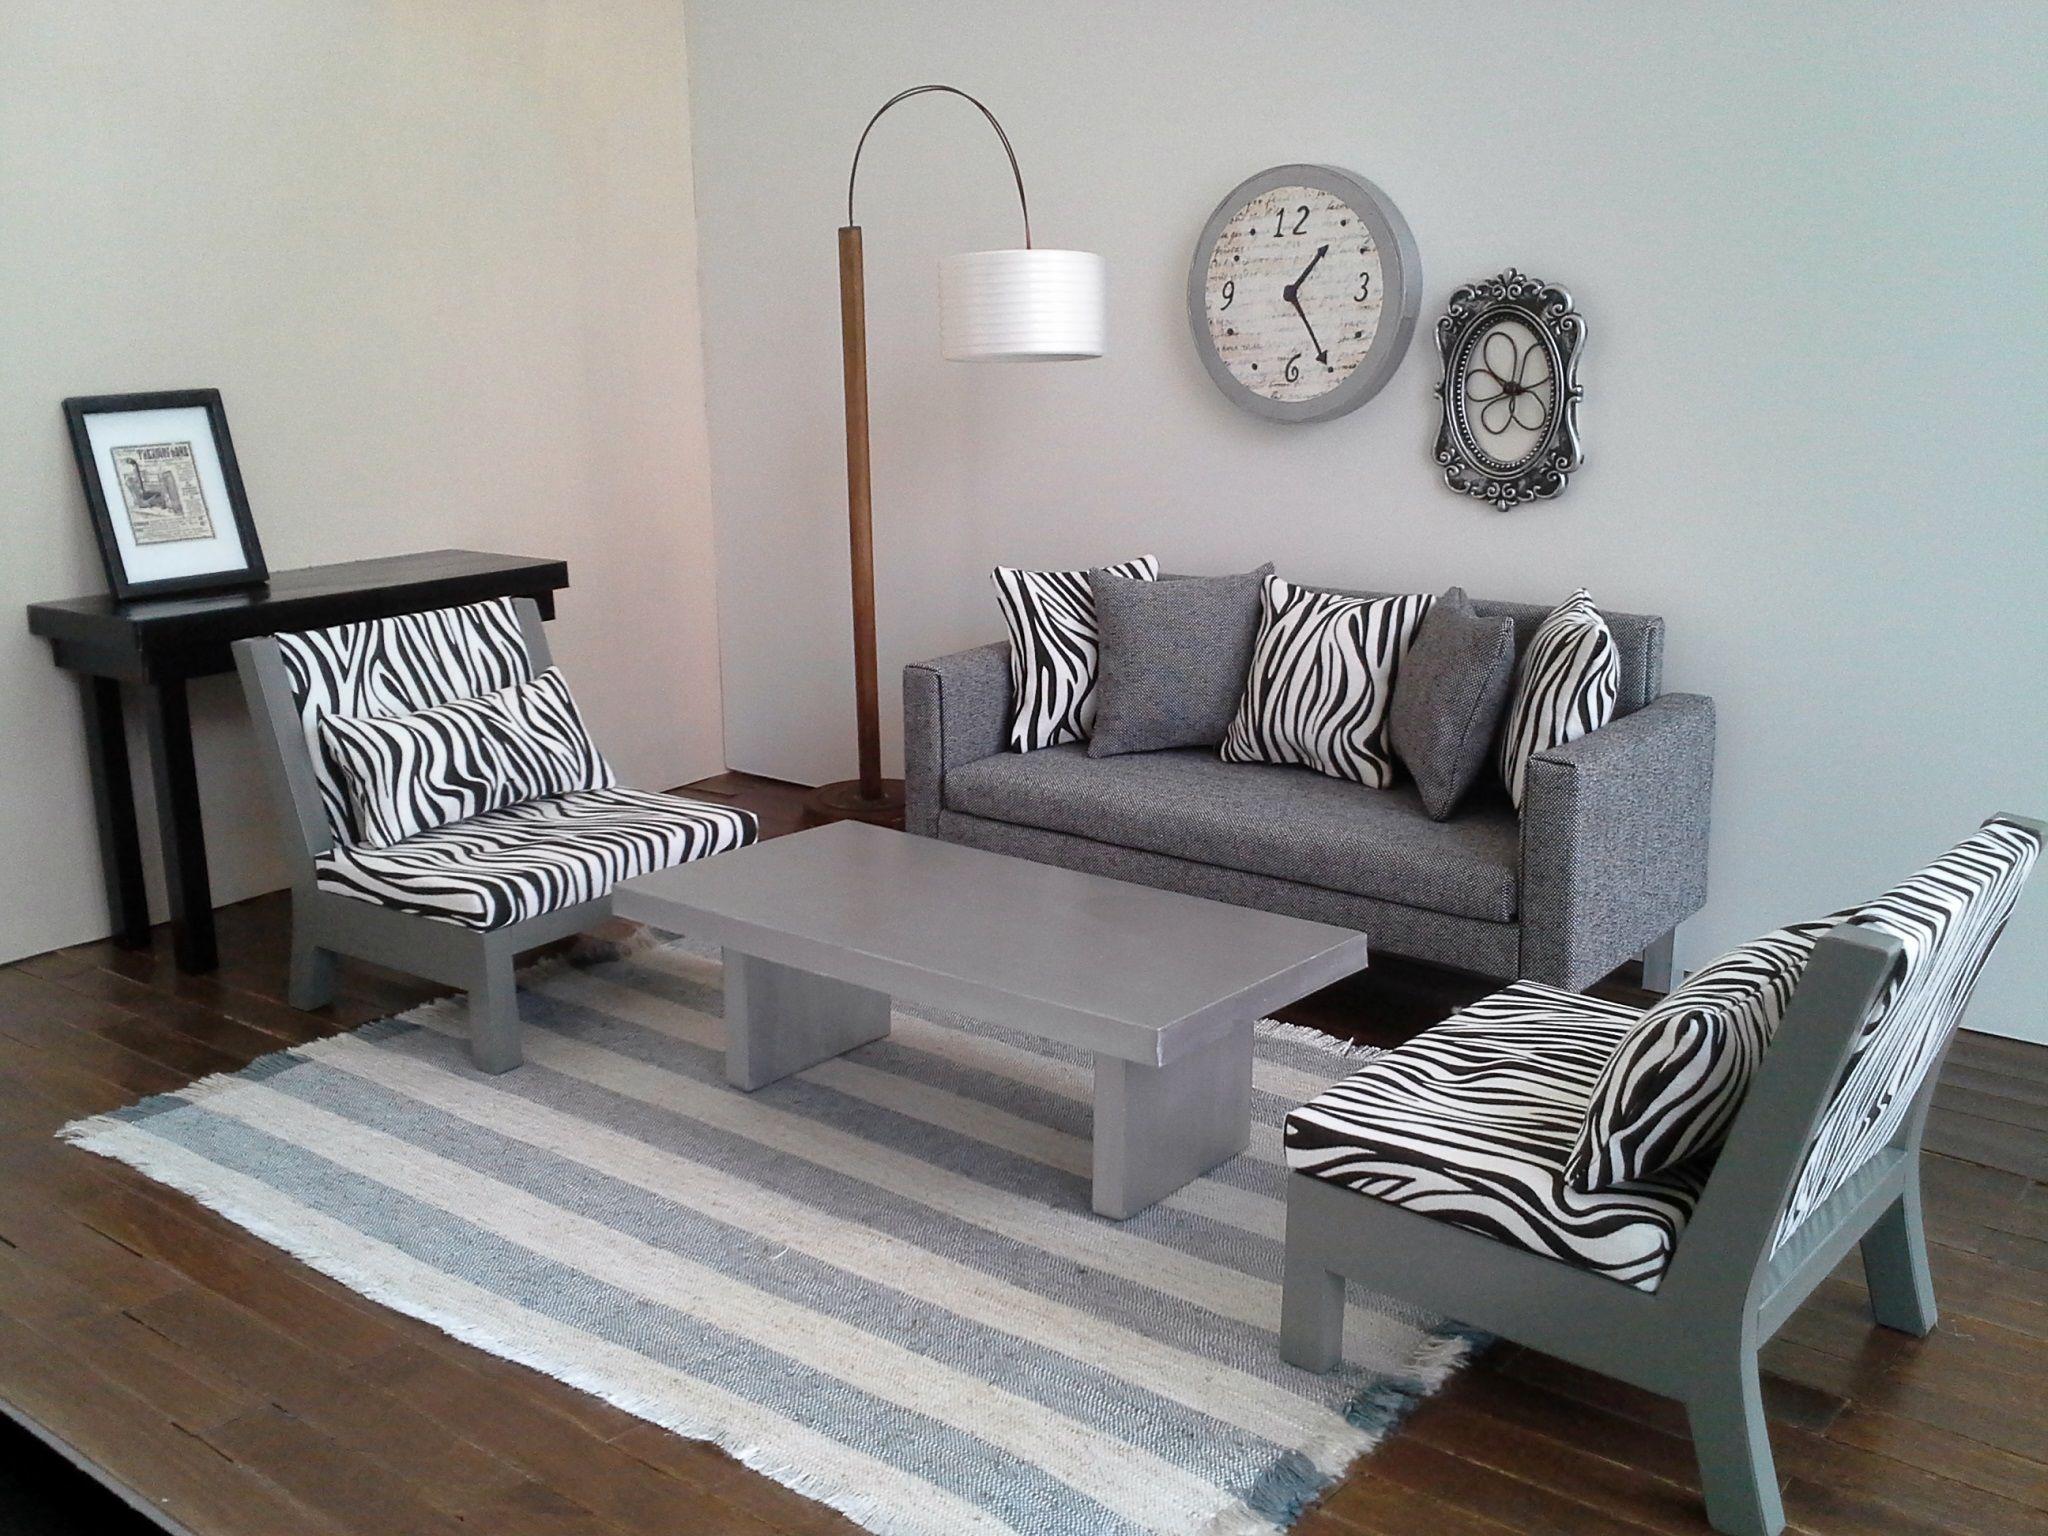 doll furniture in zebra print and grey romus designs